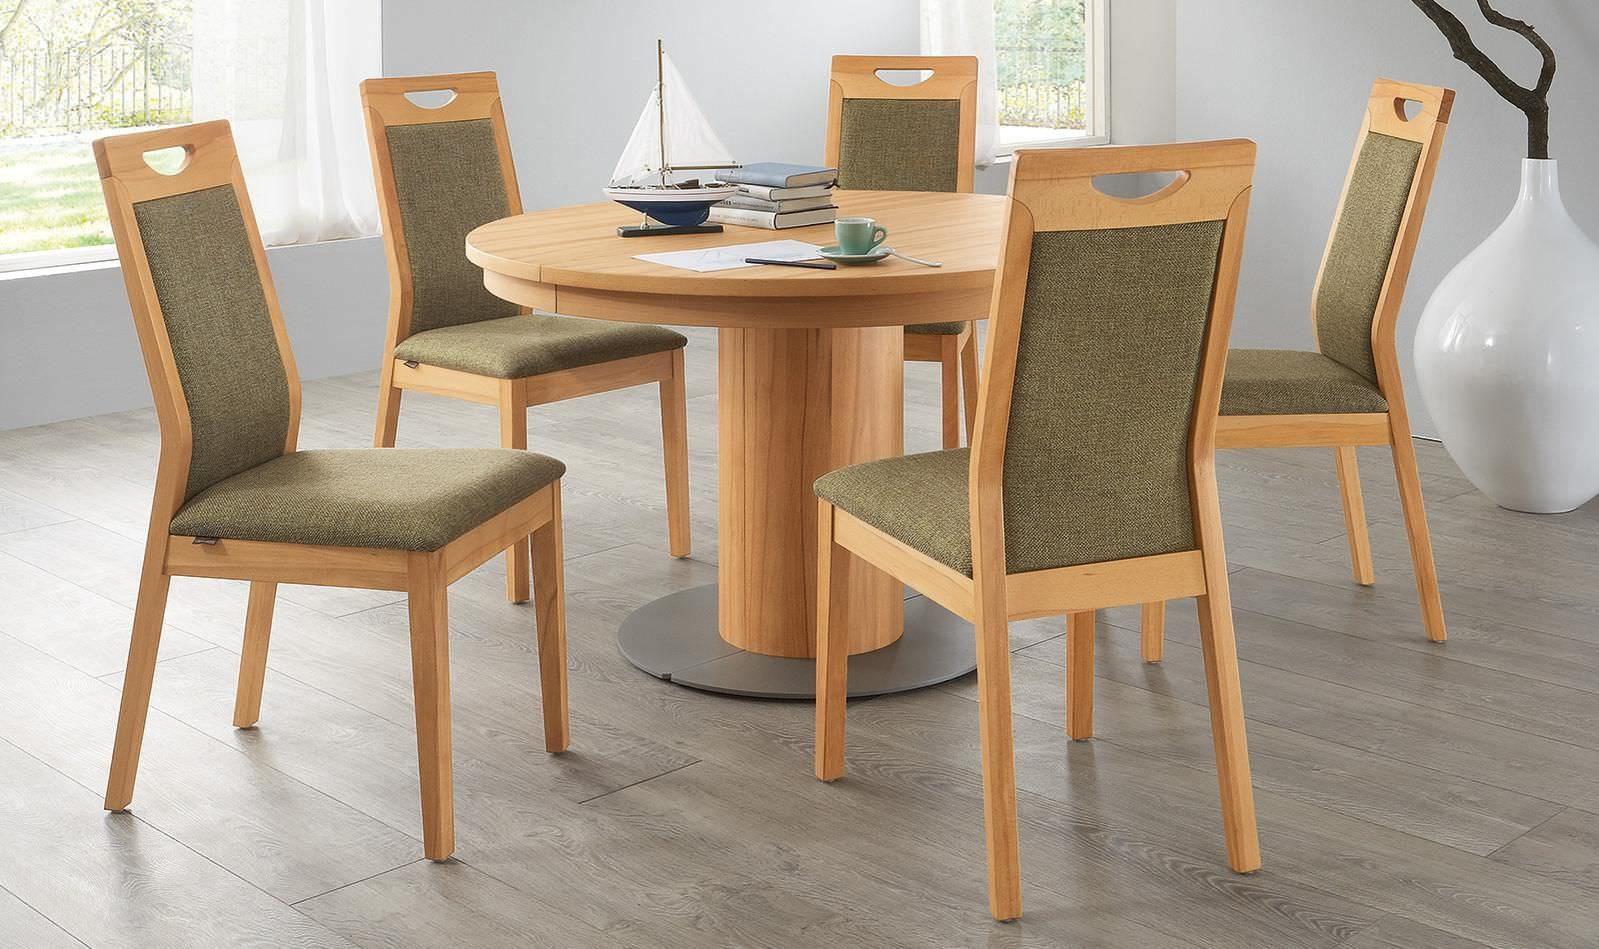 Mesas de madera redondas for Mesas antiguas de madera